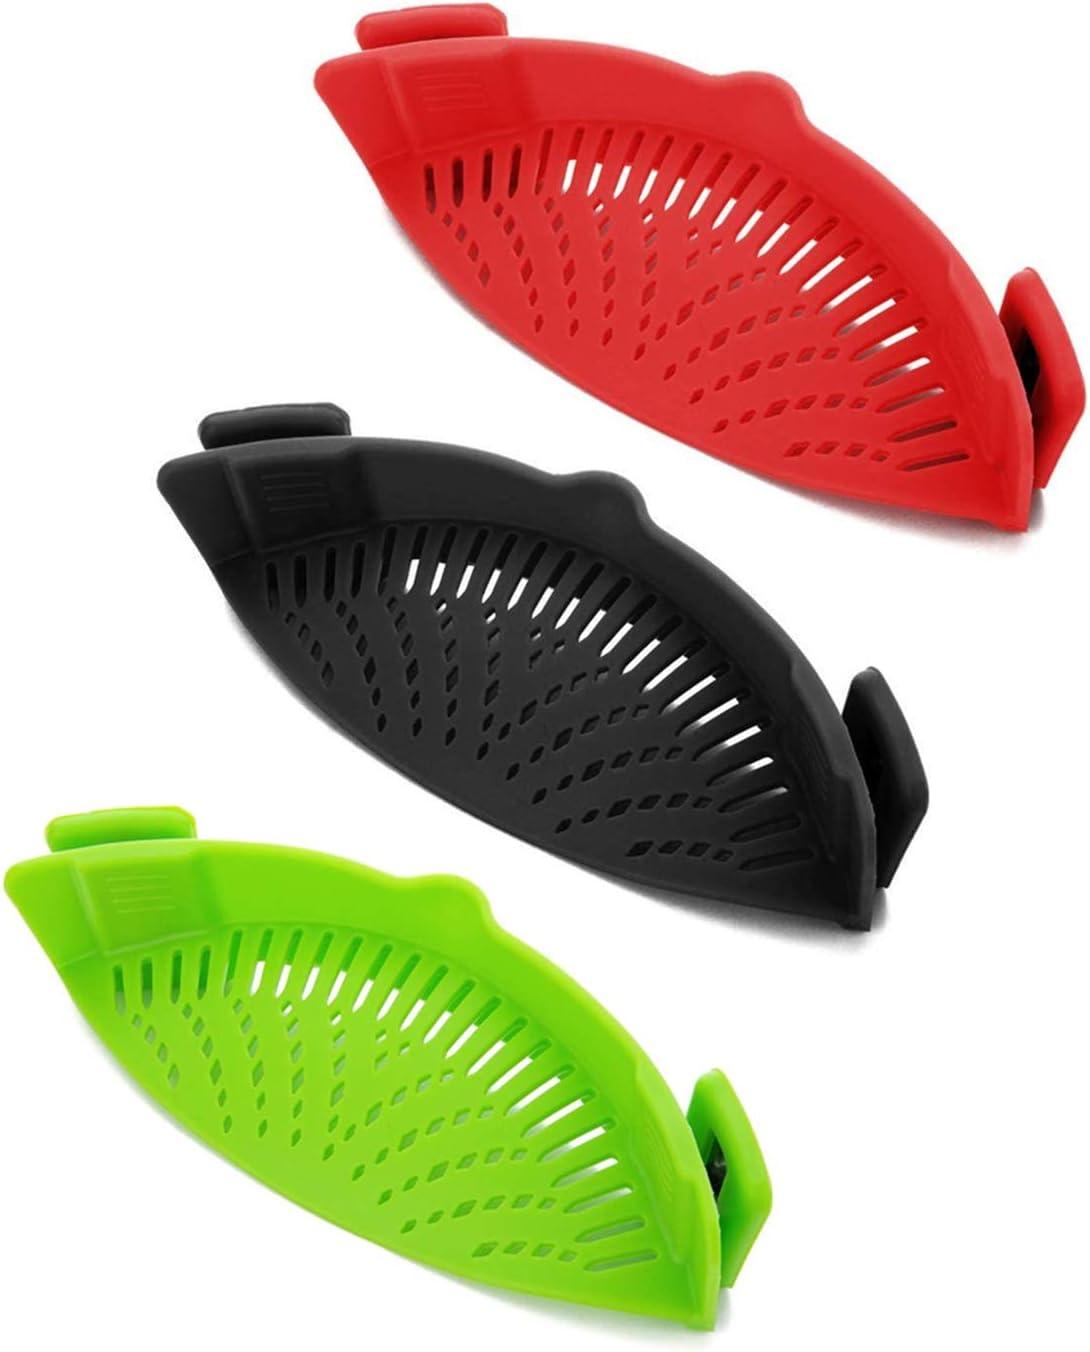 3 Pieces Clip-On Strain Strainer Kitchen Food Strainer Snap Strainer Heat Resistant Silicone Colander Spout for Pasta Vegetable Noodles Pot Bowl Pan (Red, Green,Black)